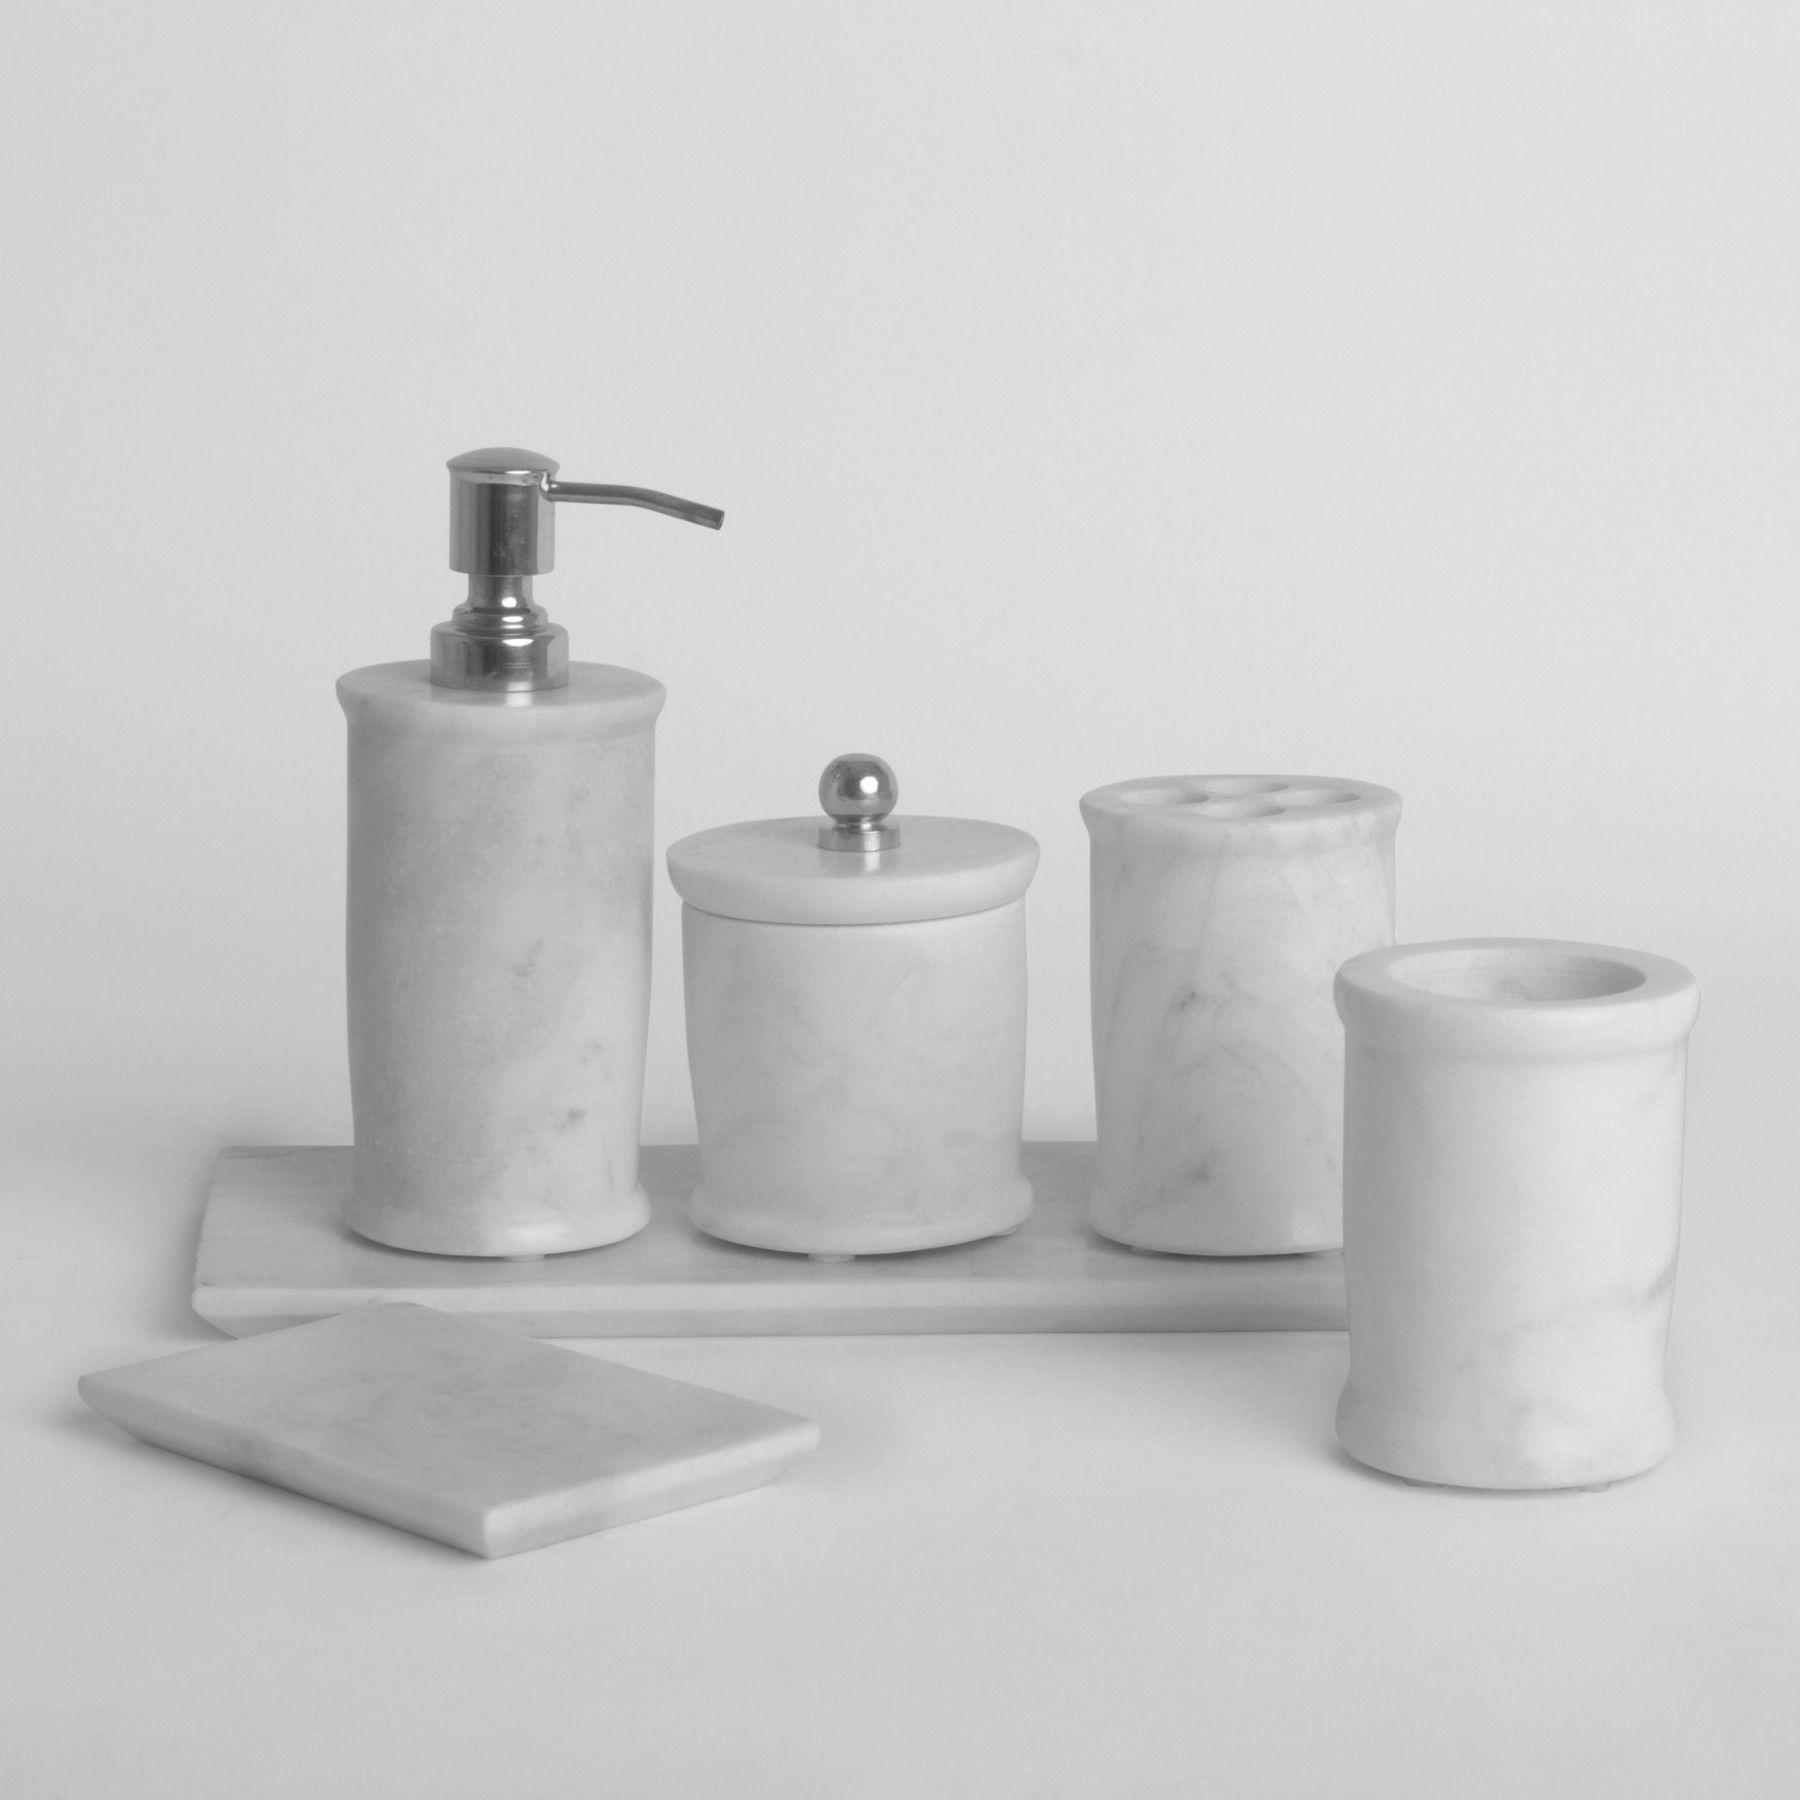 Cade Marble Bath Set   Bathroom Accessories   Bath